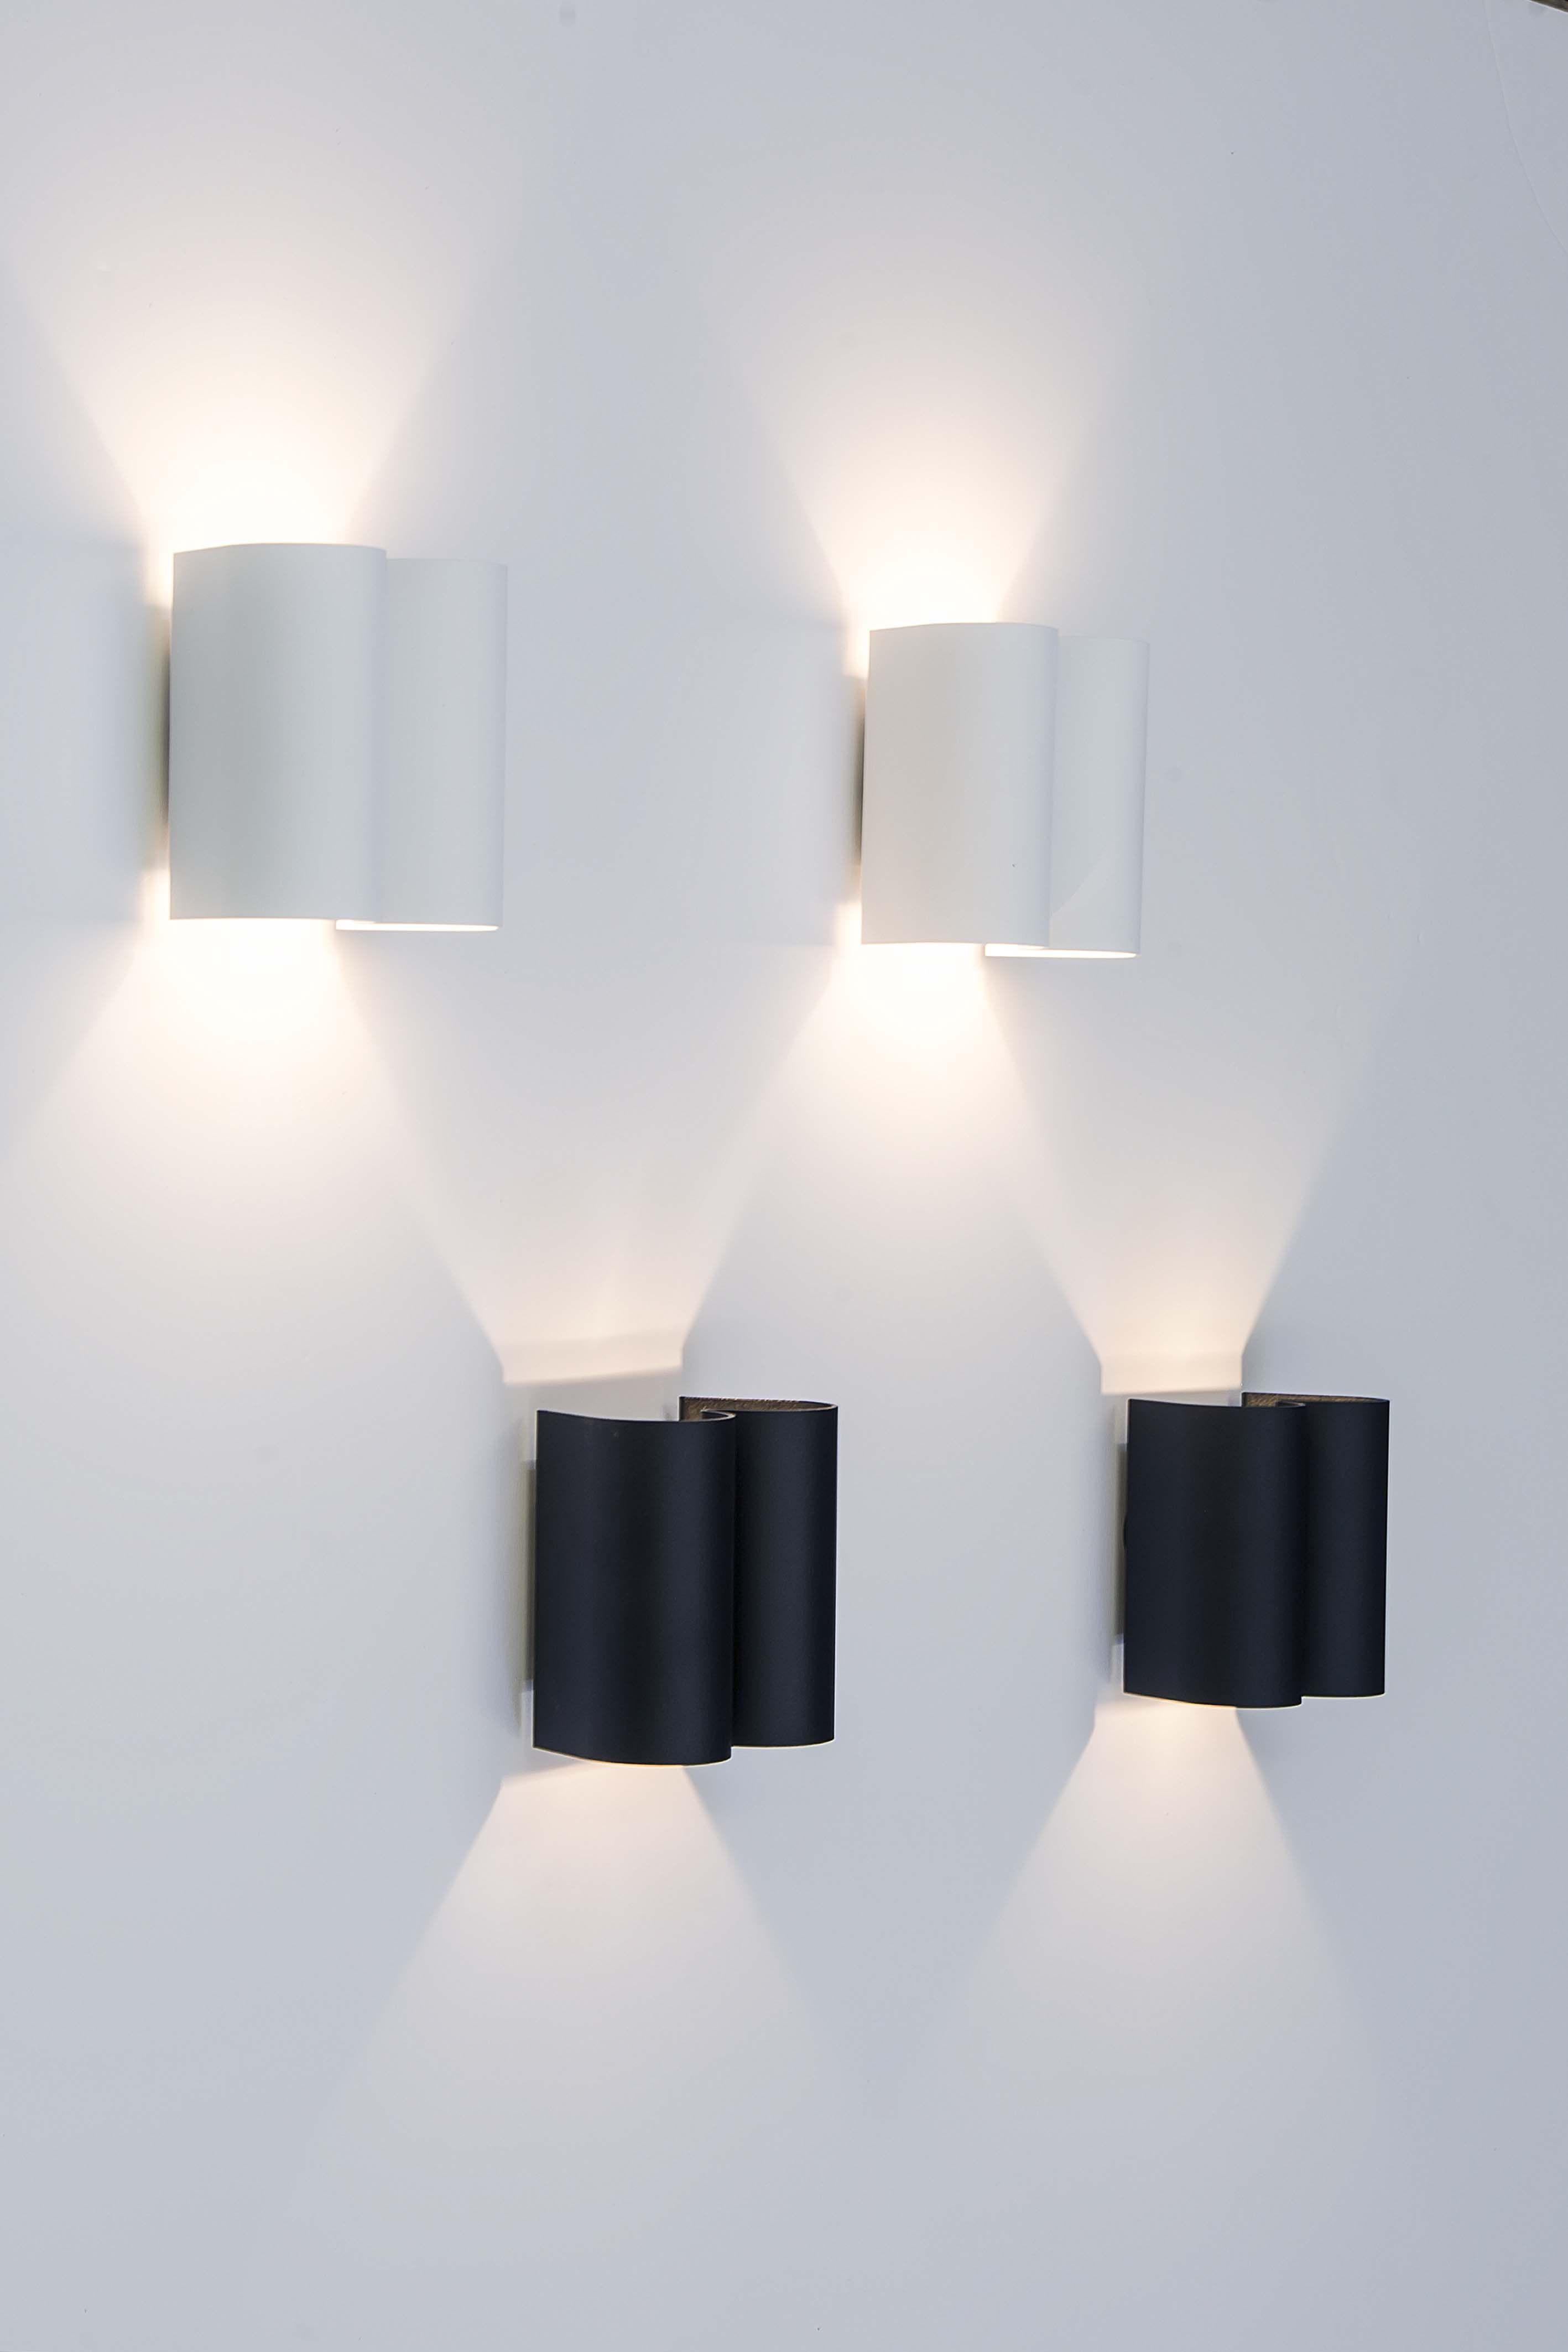 TWERKIT 2 JR. BLACK & WHITE design by Skwon for DARK® #LED | all colors | new darlings 2700K 3000K 4000K | 85 CRI